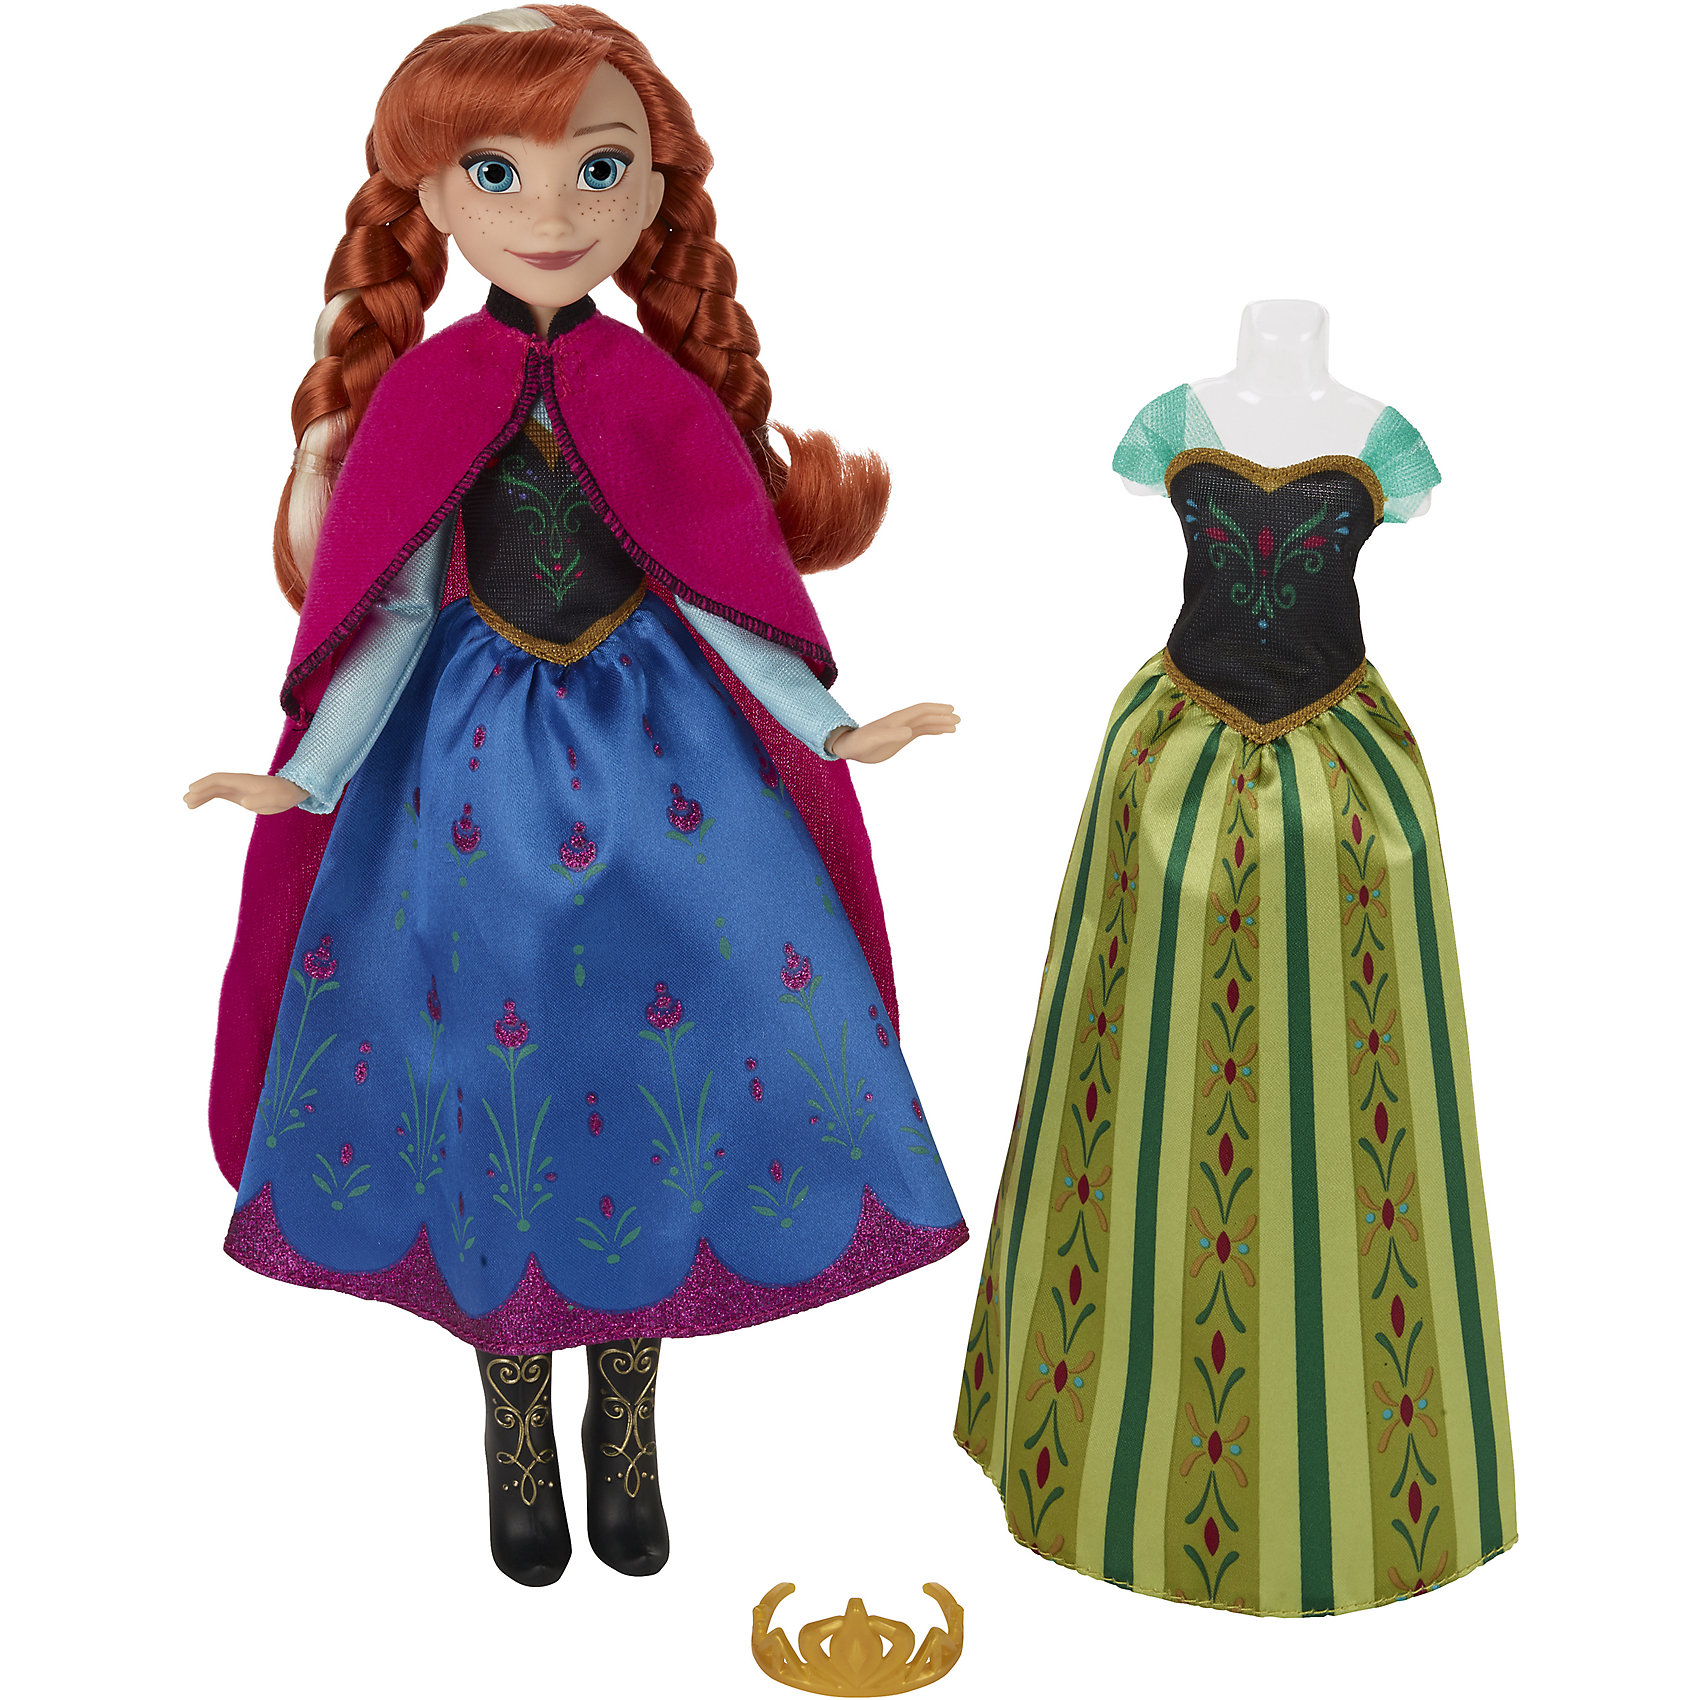 Hasbro Кукла Анна, со сменным нарядом, Холодное сердце кукла анна с олафом 15 см холодное сердце